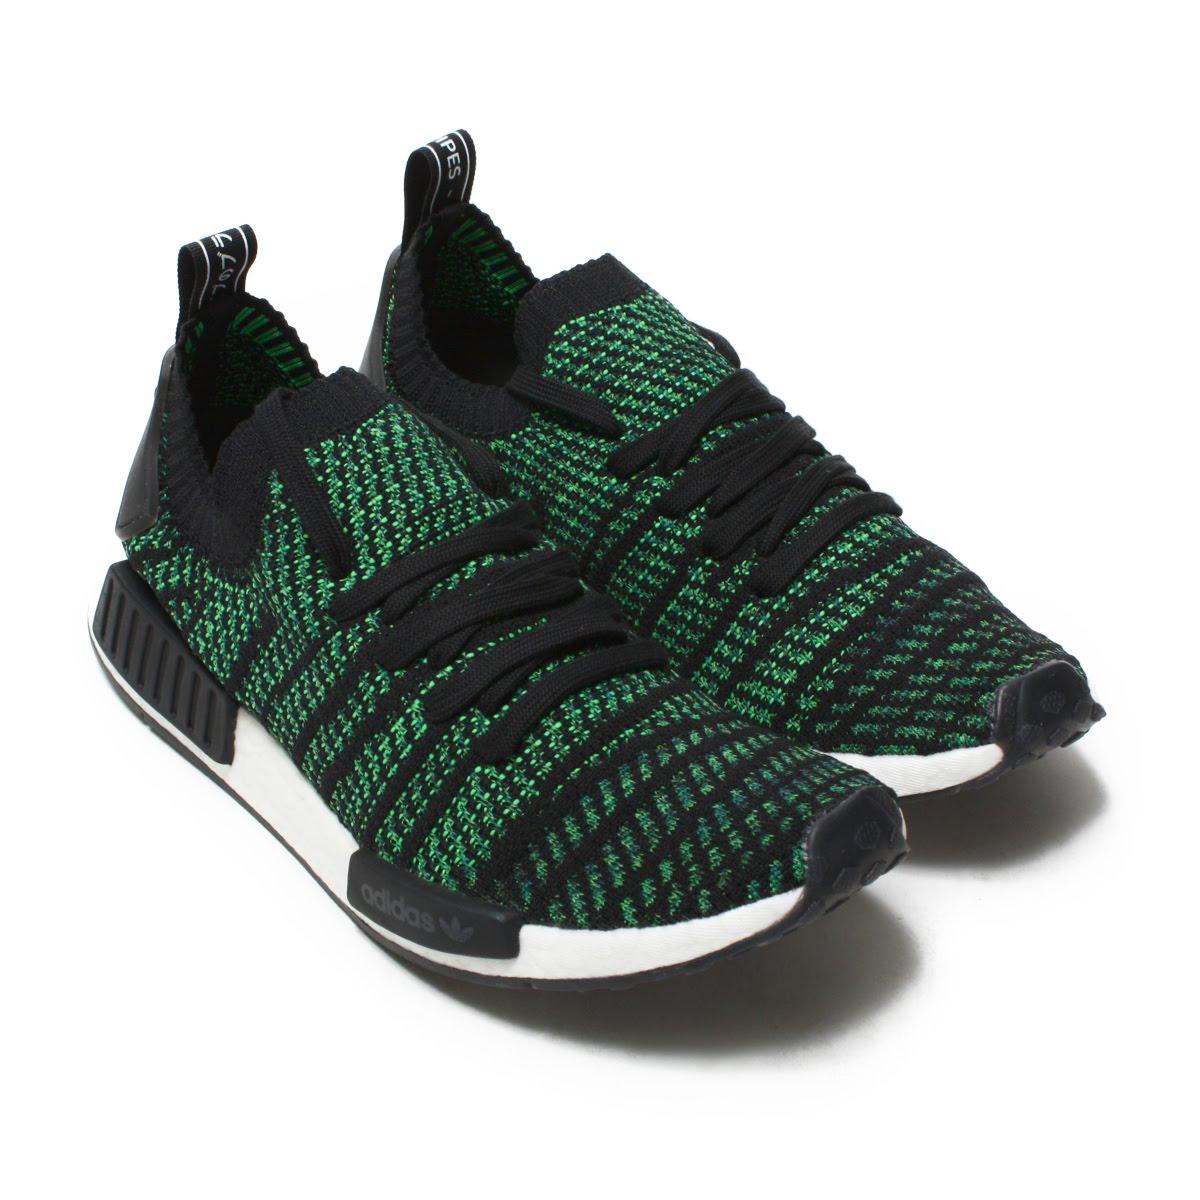 adidas Originals NMD_R1 STLT PK(アディダス オリジナルス エヌエムディーTS1 PK GTX)Core Black/Noble Green/Bold Green【メンズ レディース スニーカー】18FW-I